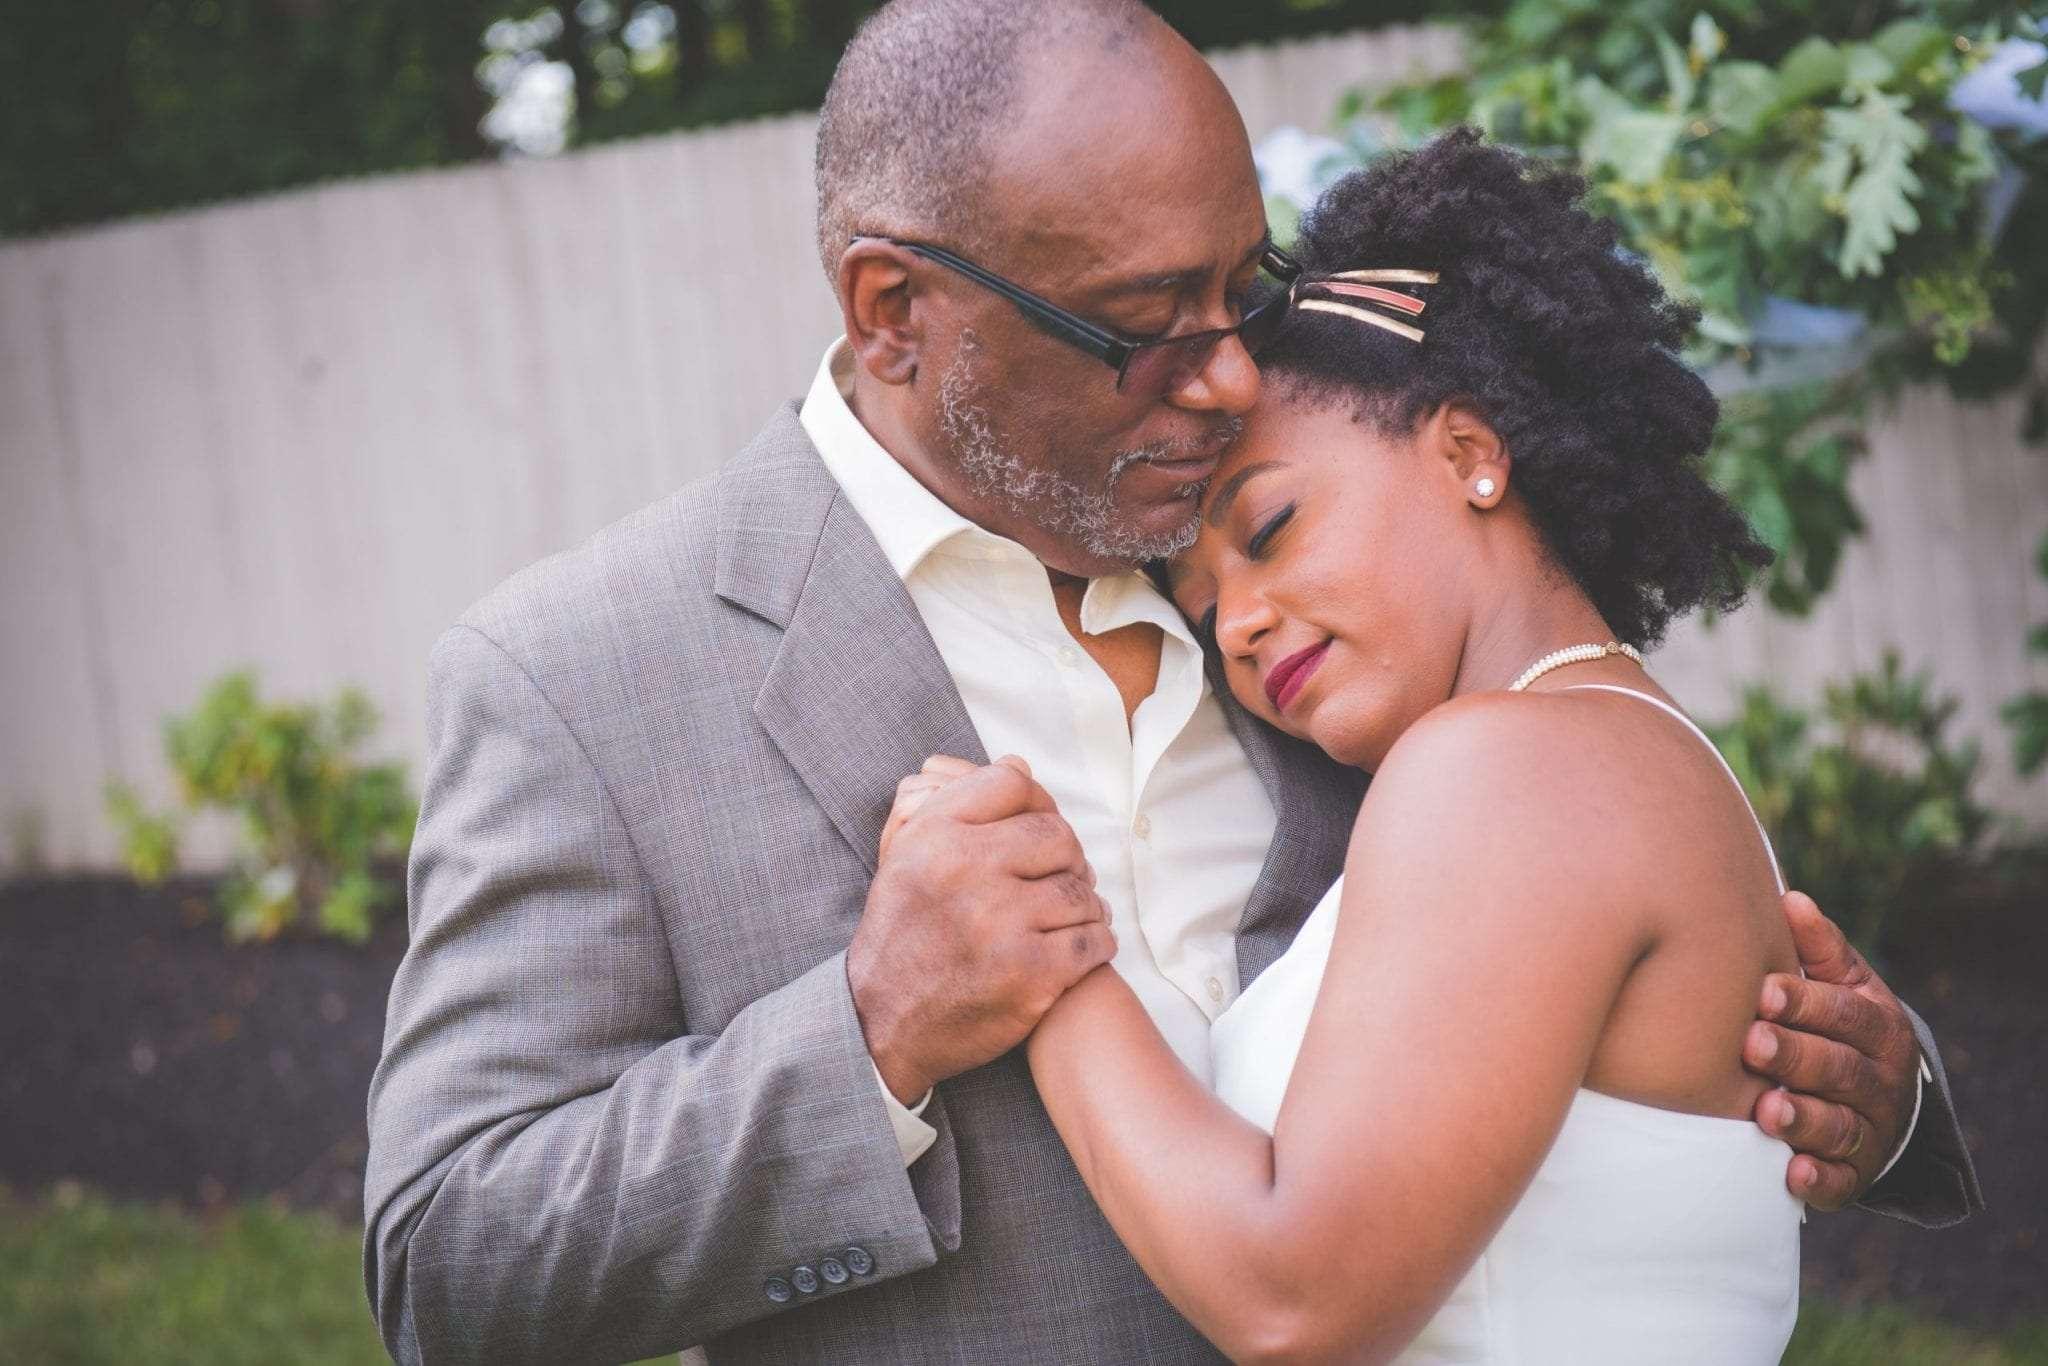 Bride and father dancing backyard wedding photography